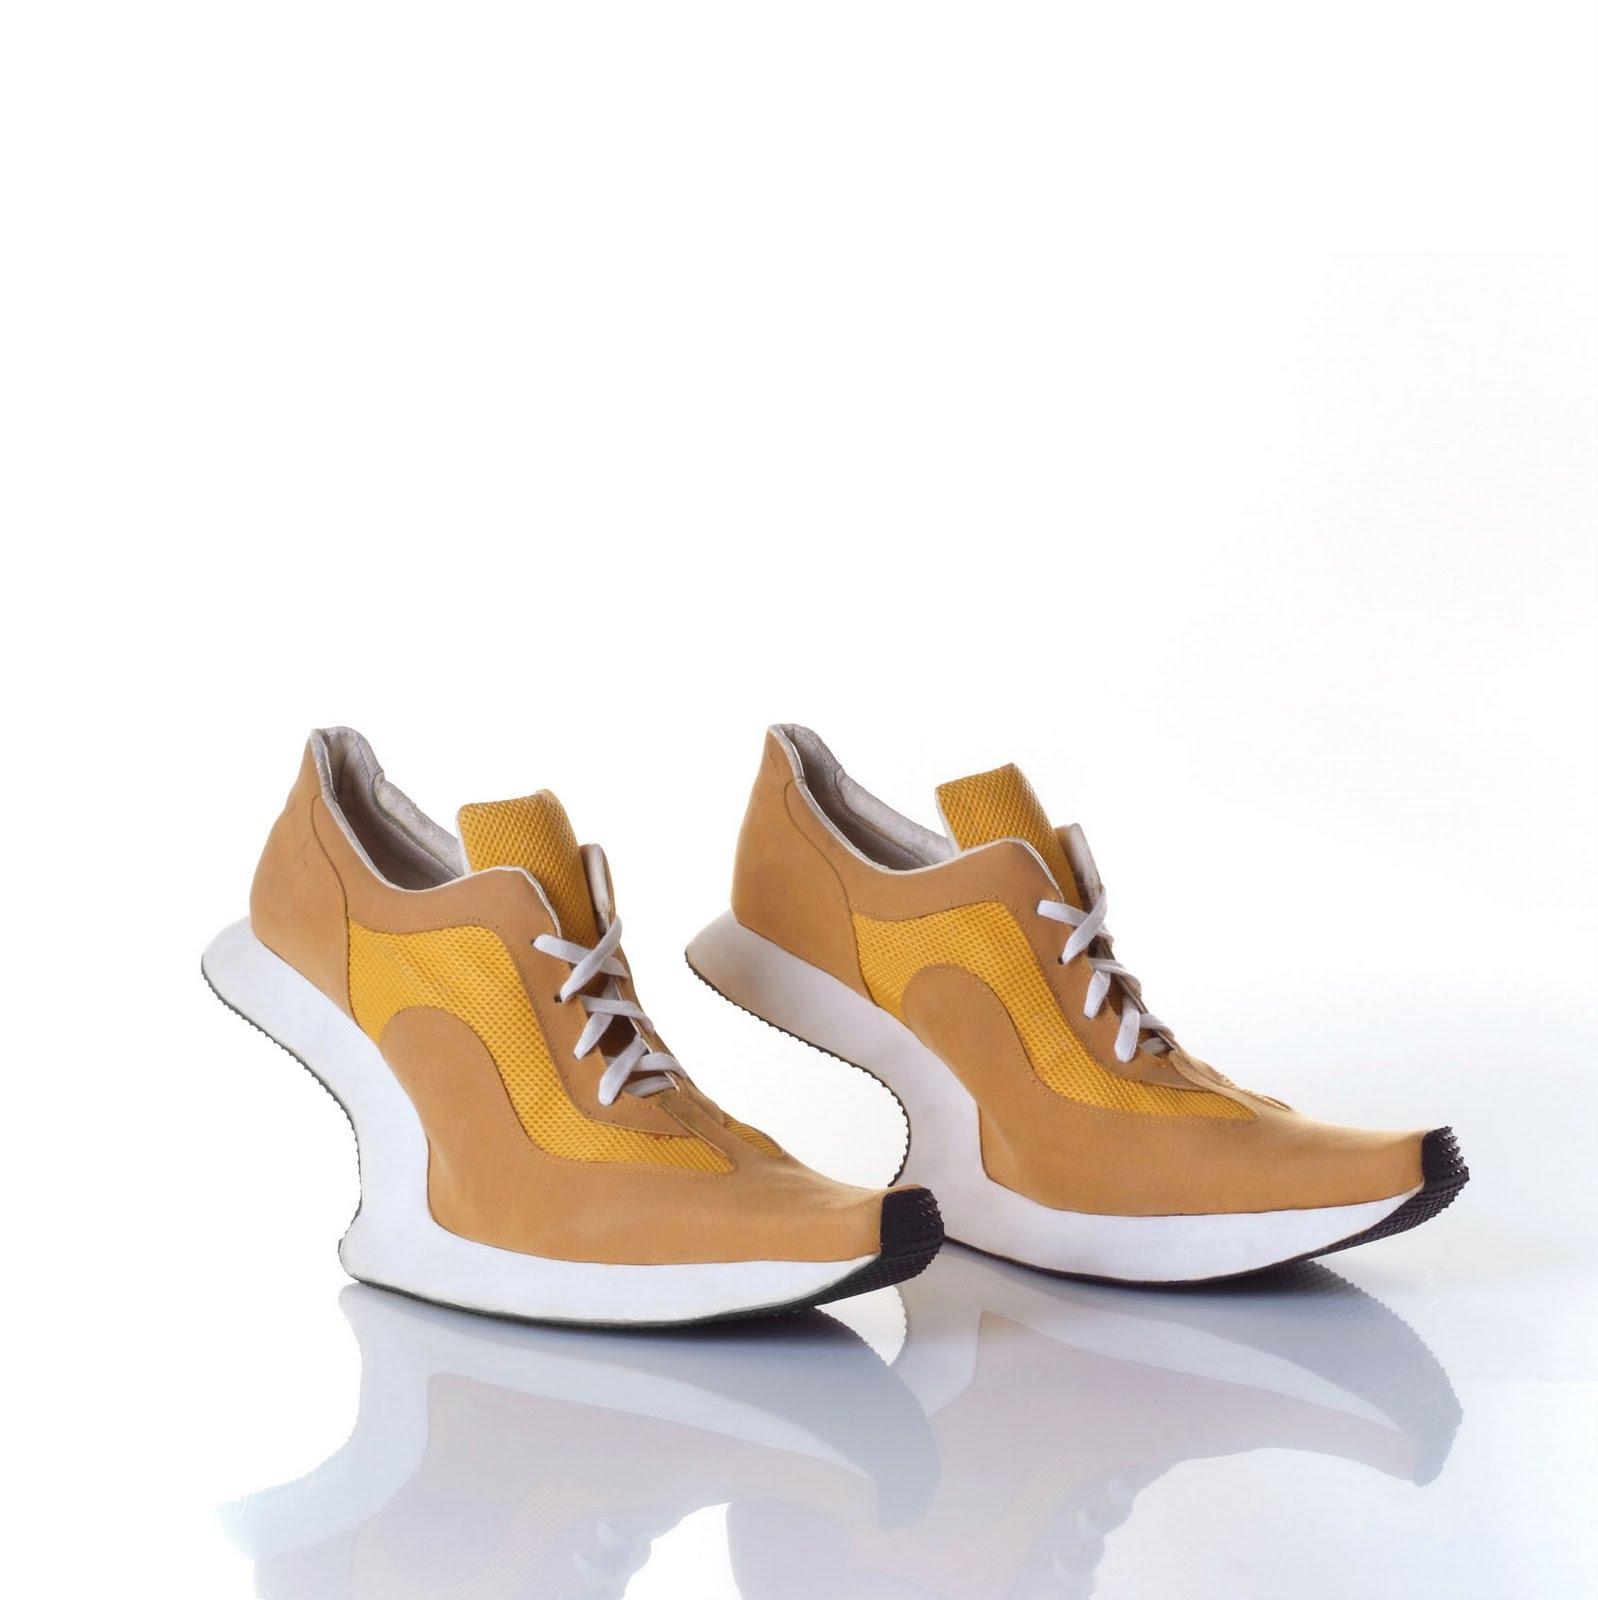 Artistic Footwear Designs by Kobi Levi  Inspirationfeed